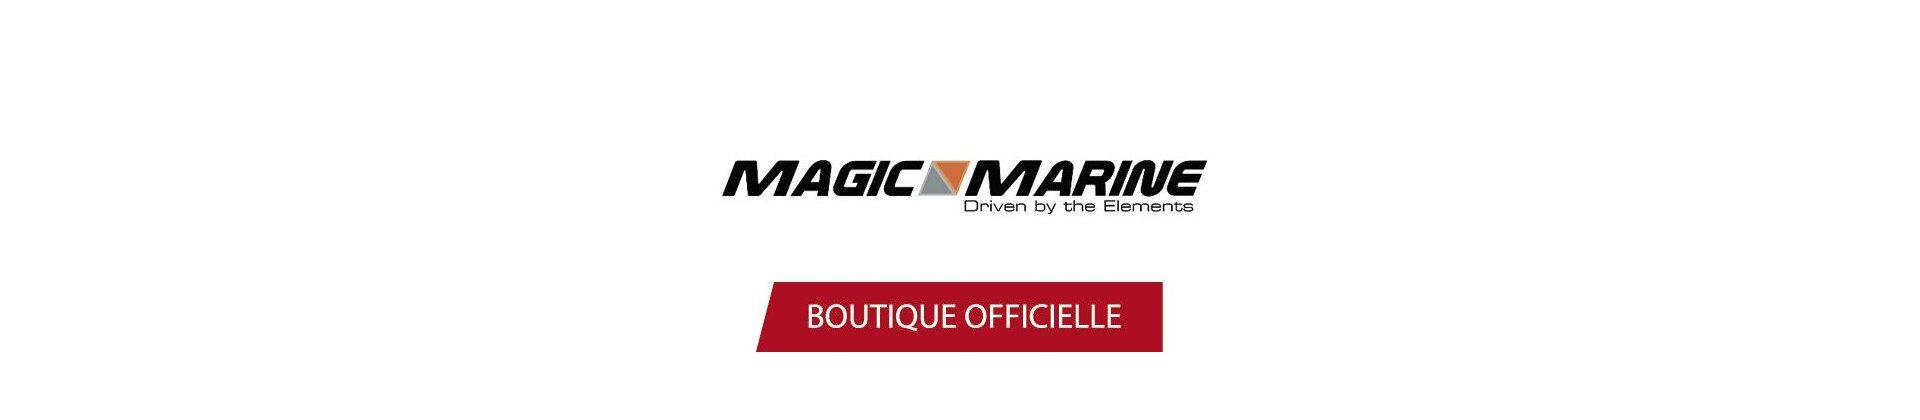 Combinaison Magic Marine